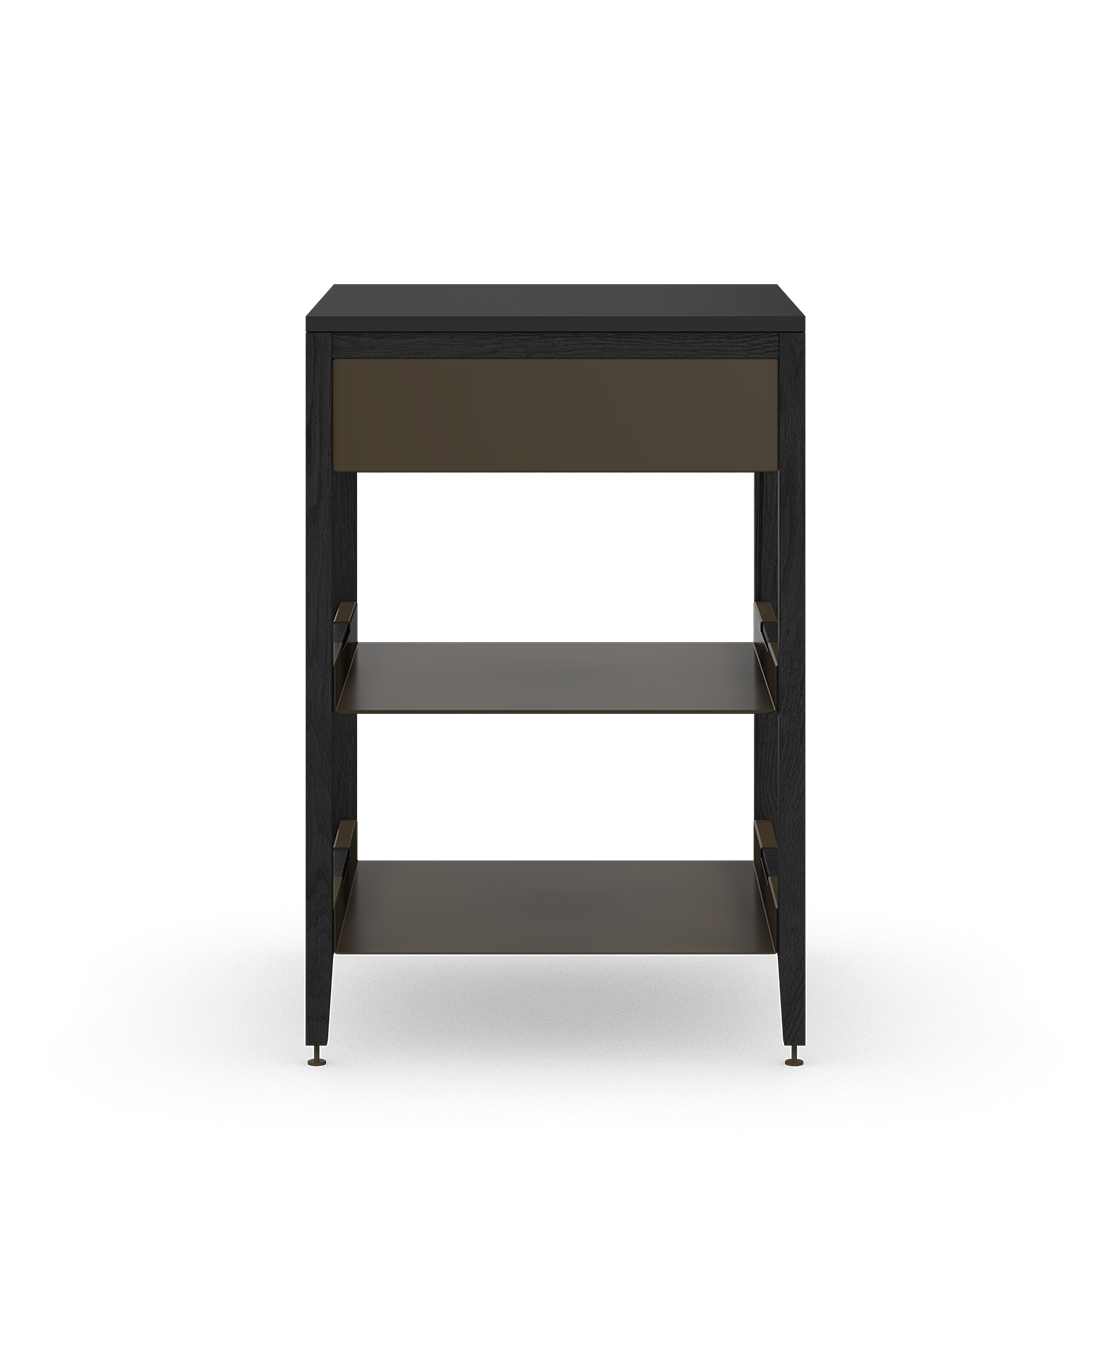 coquo radix midnight black stained oak solid wood modular 2 shelves false front base corner kitchen cabinet 24 inch C1-CC-24SB-0021-BK